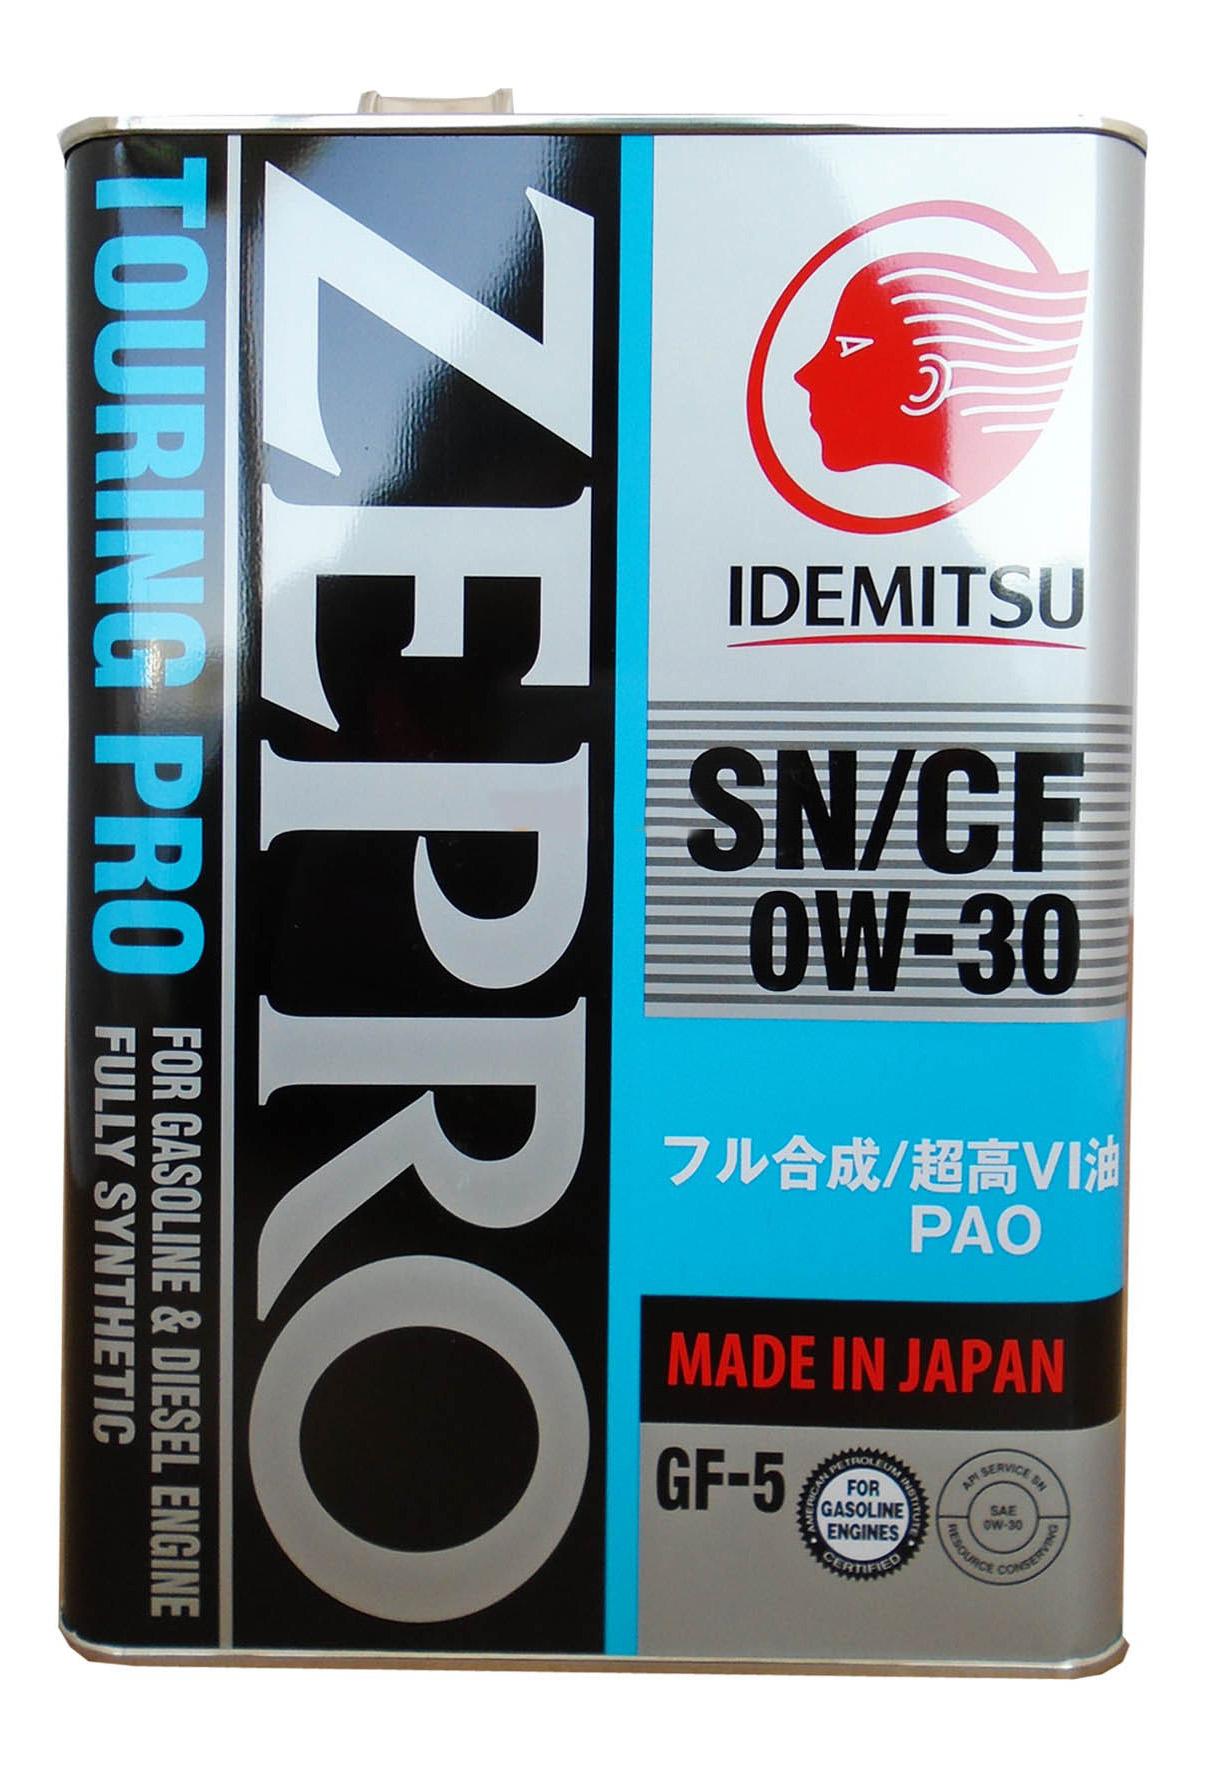 Моторное масло Idemitsu Zepro Touring Pro 0W-30 4л